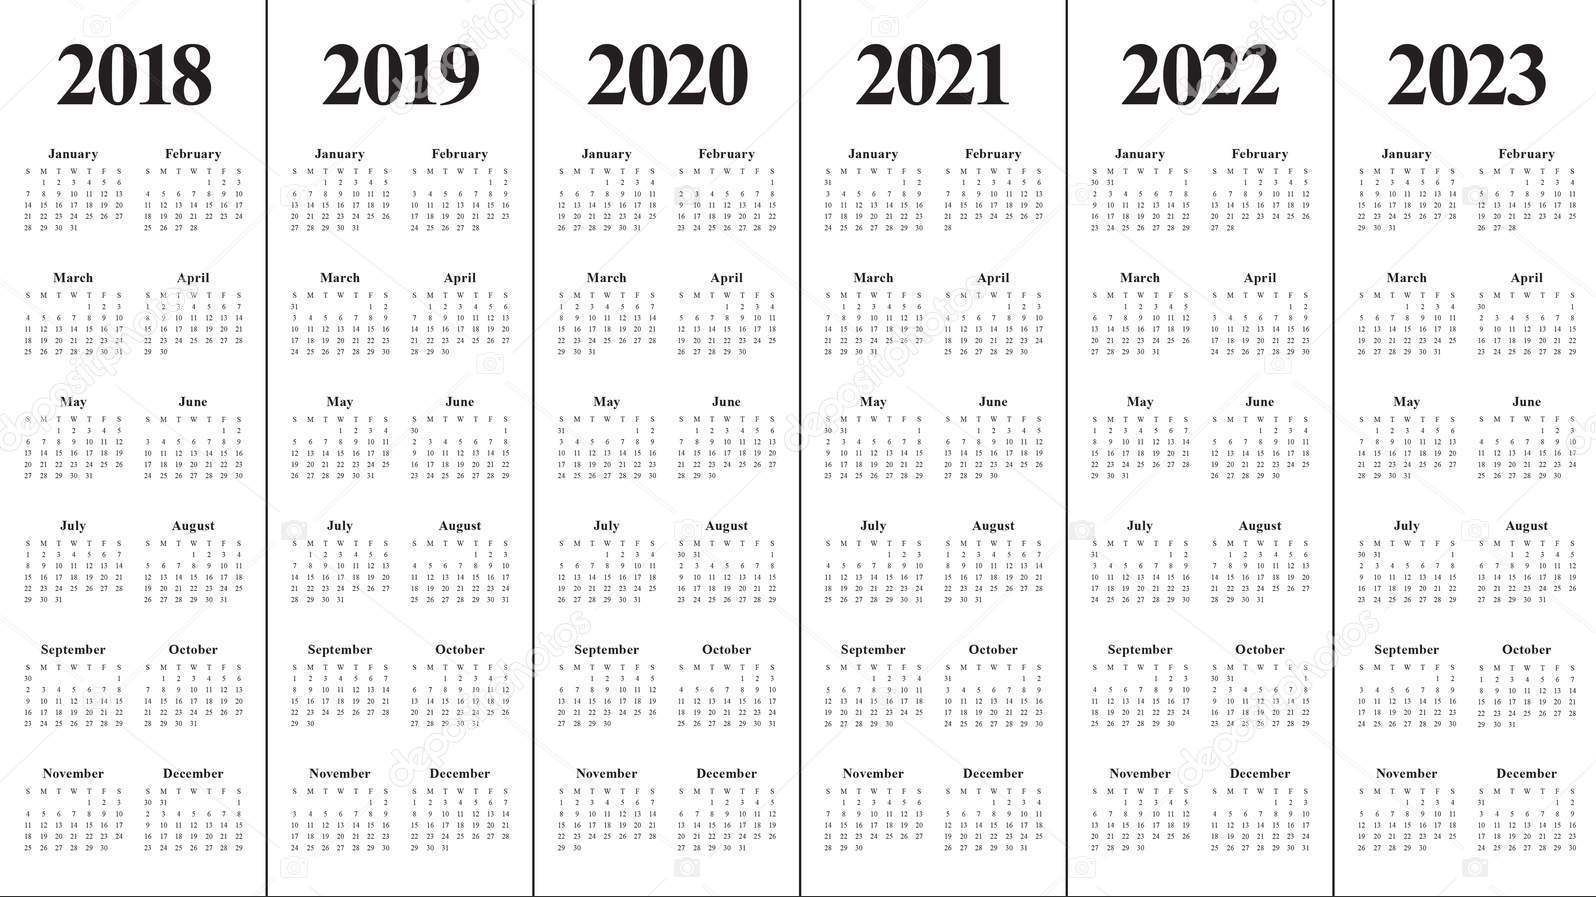 3 Year Calendars Printable - Bance